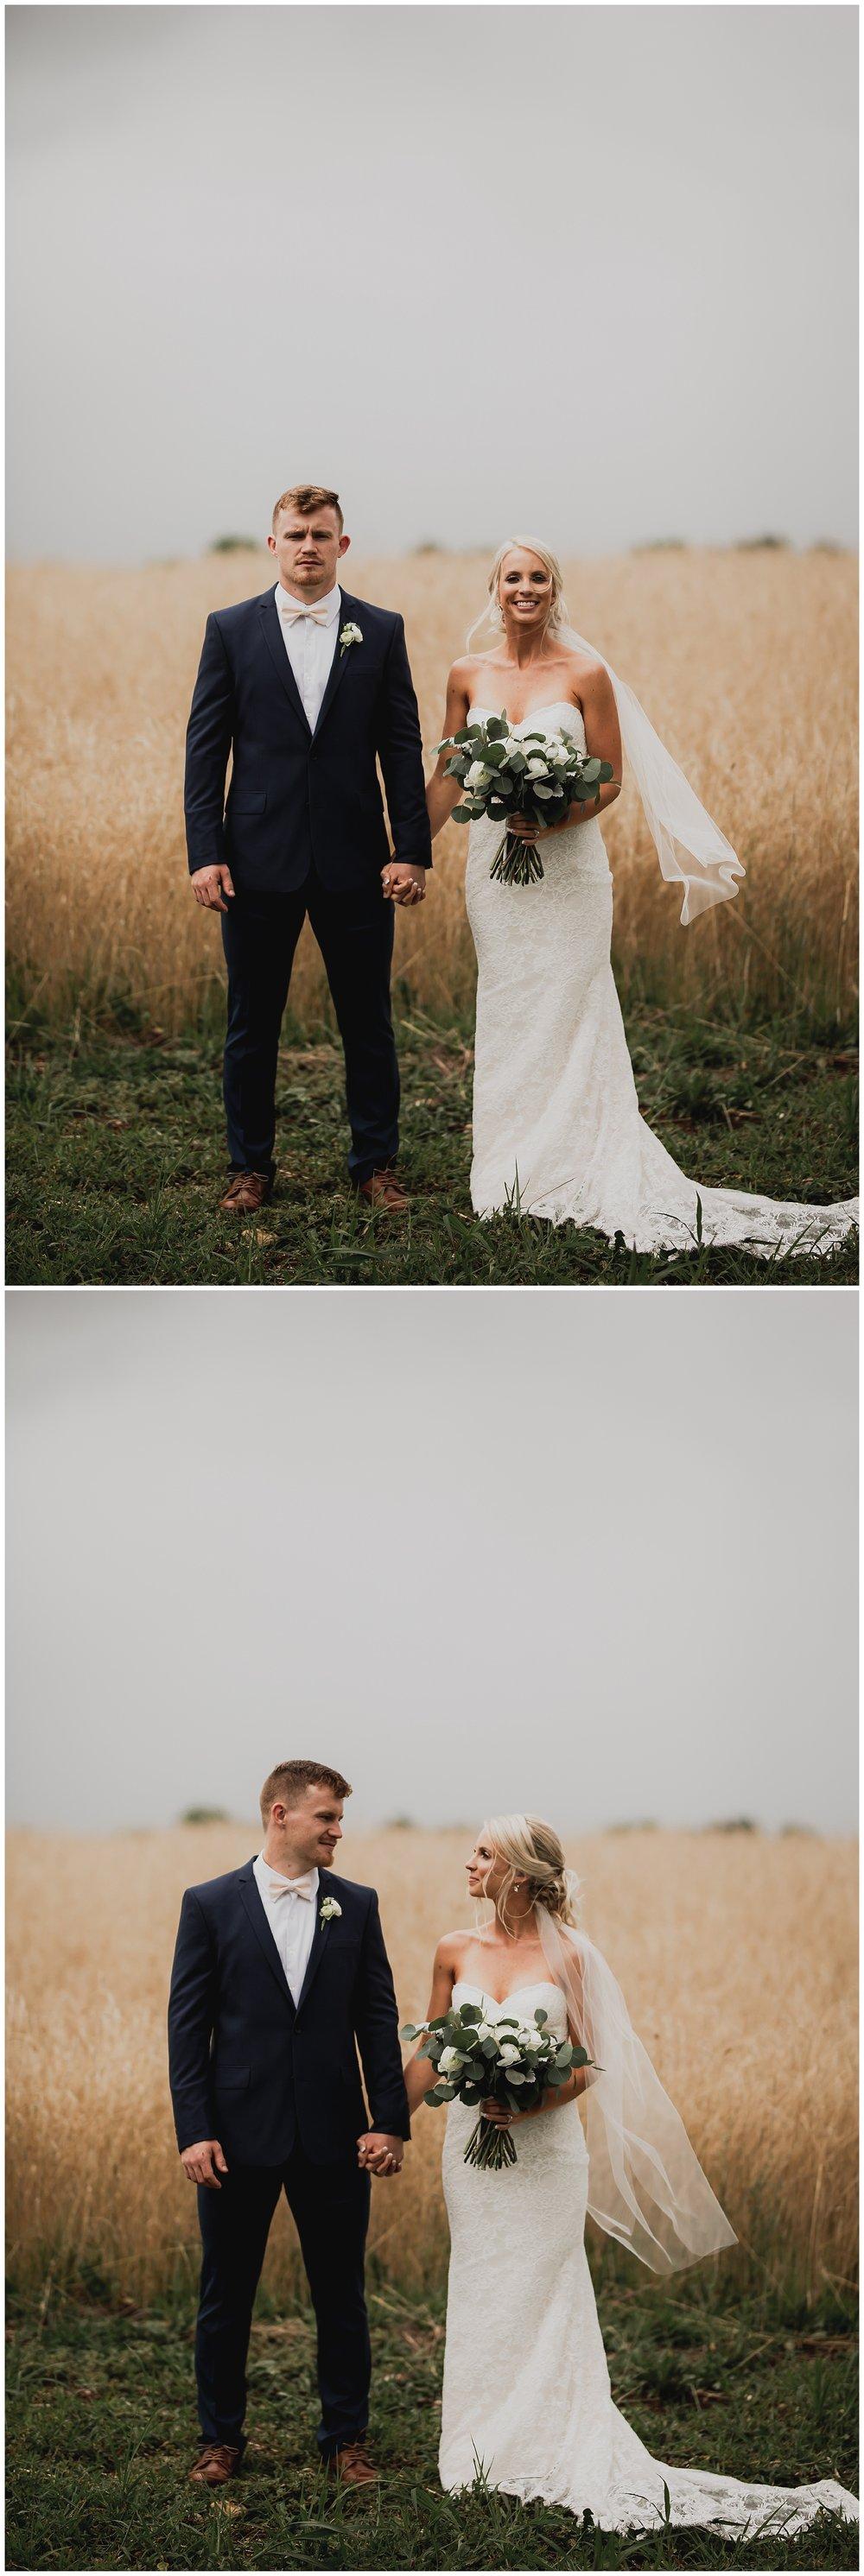 WISCONSIN WEDDING PHOTOGRAPHER 130.jpg